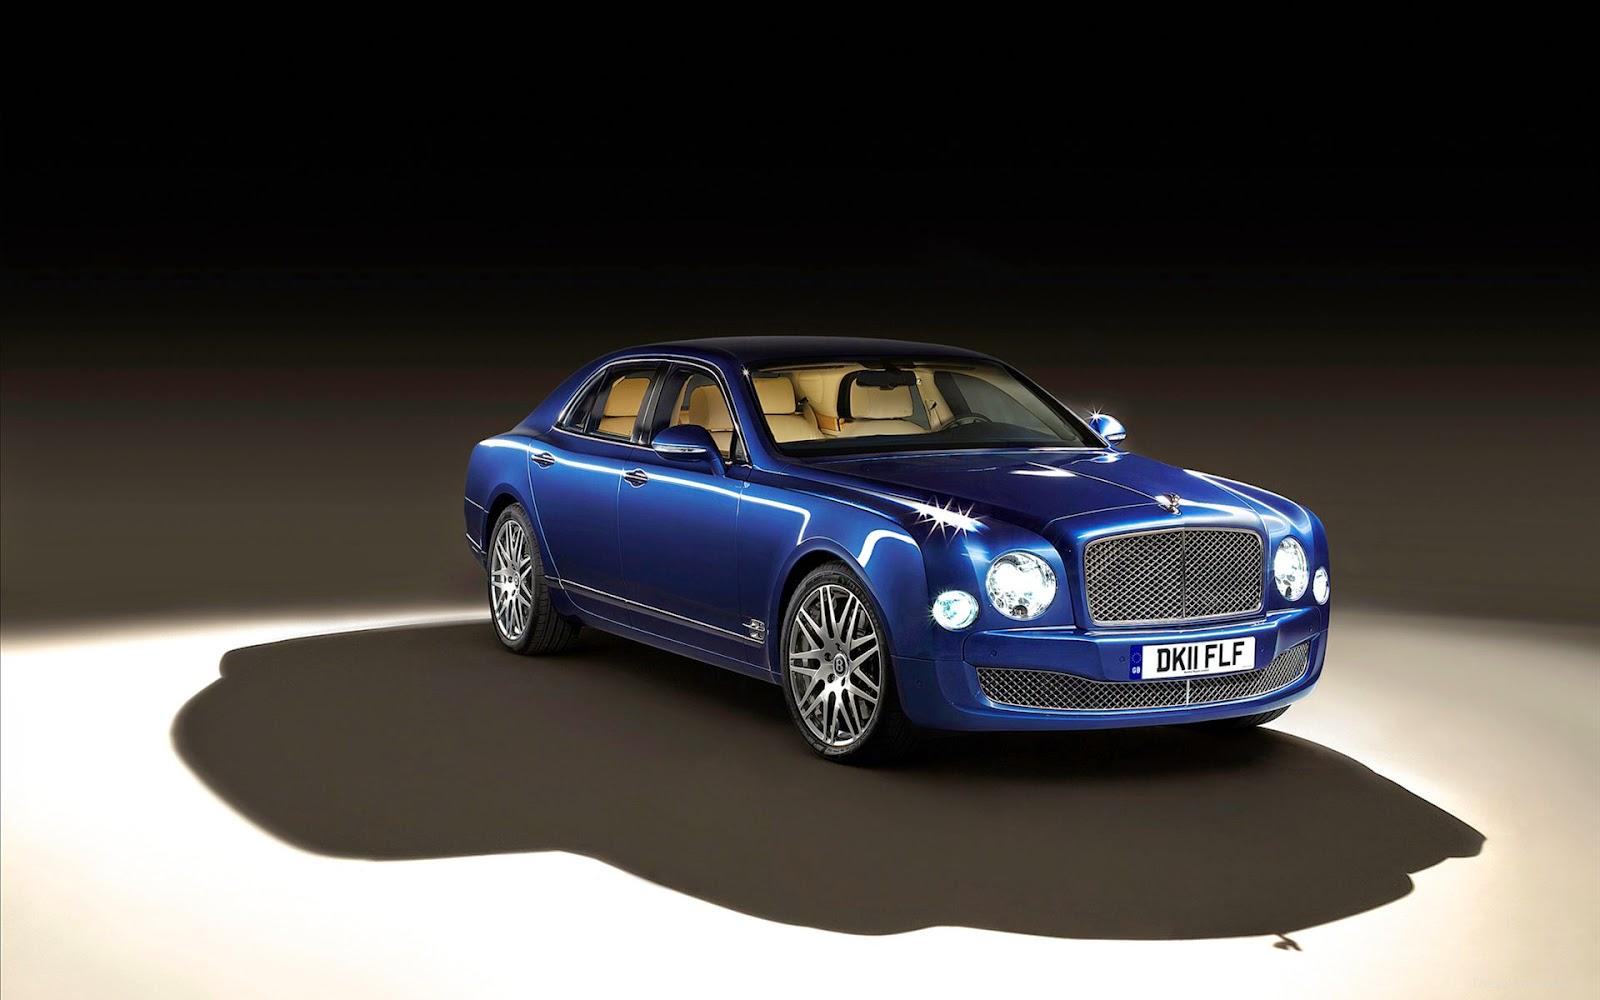 http://www.autocarsinfo.com/2014/10/2013-bentley-mulsanne-executive-best.html